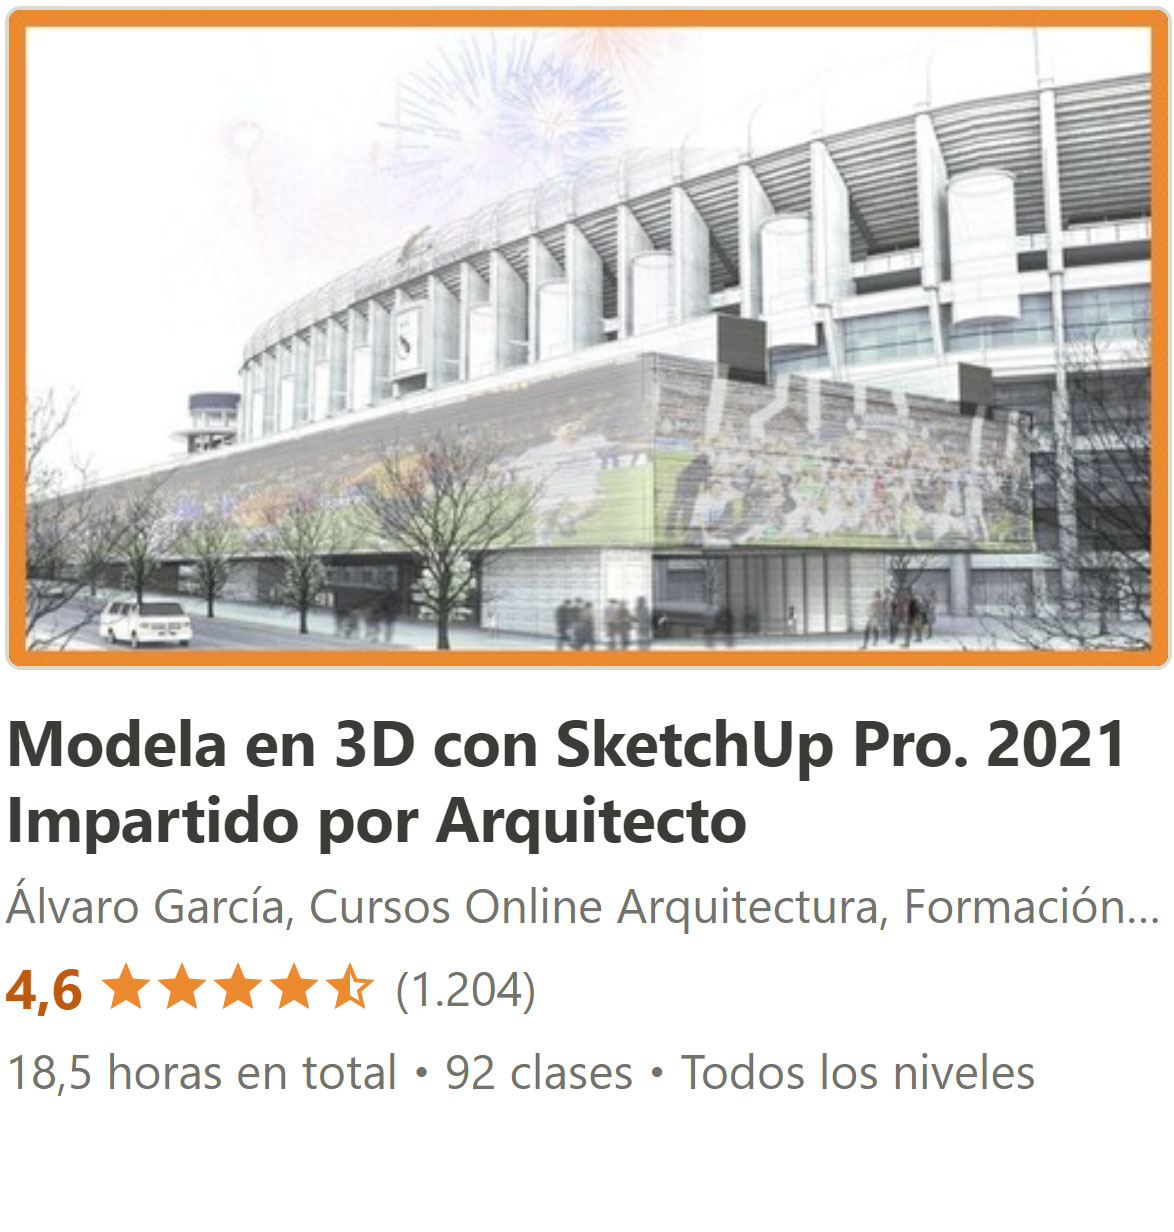 Modela-en-3D-con-SketchUp-Pro.-2021-Impartido-por